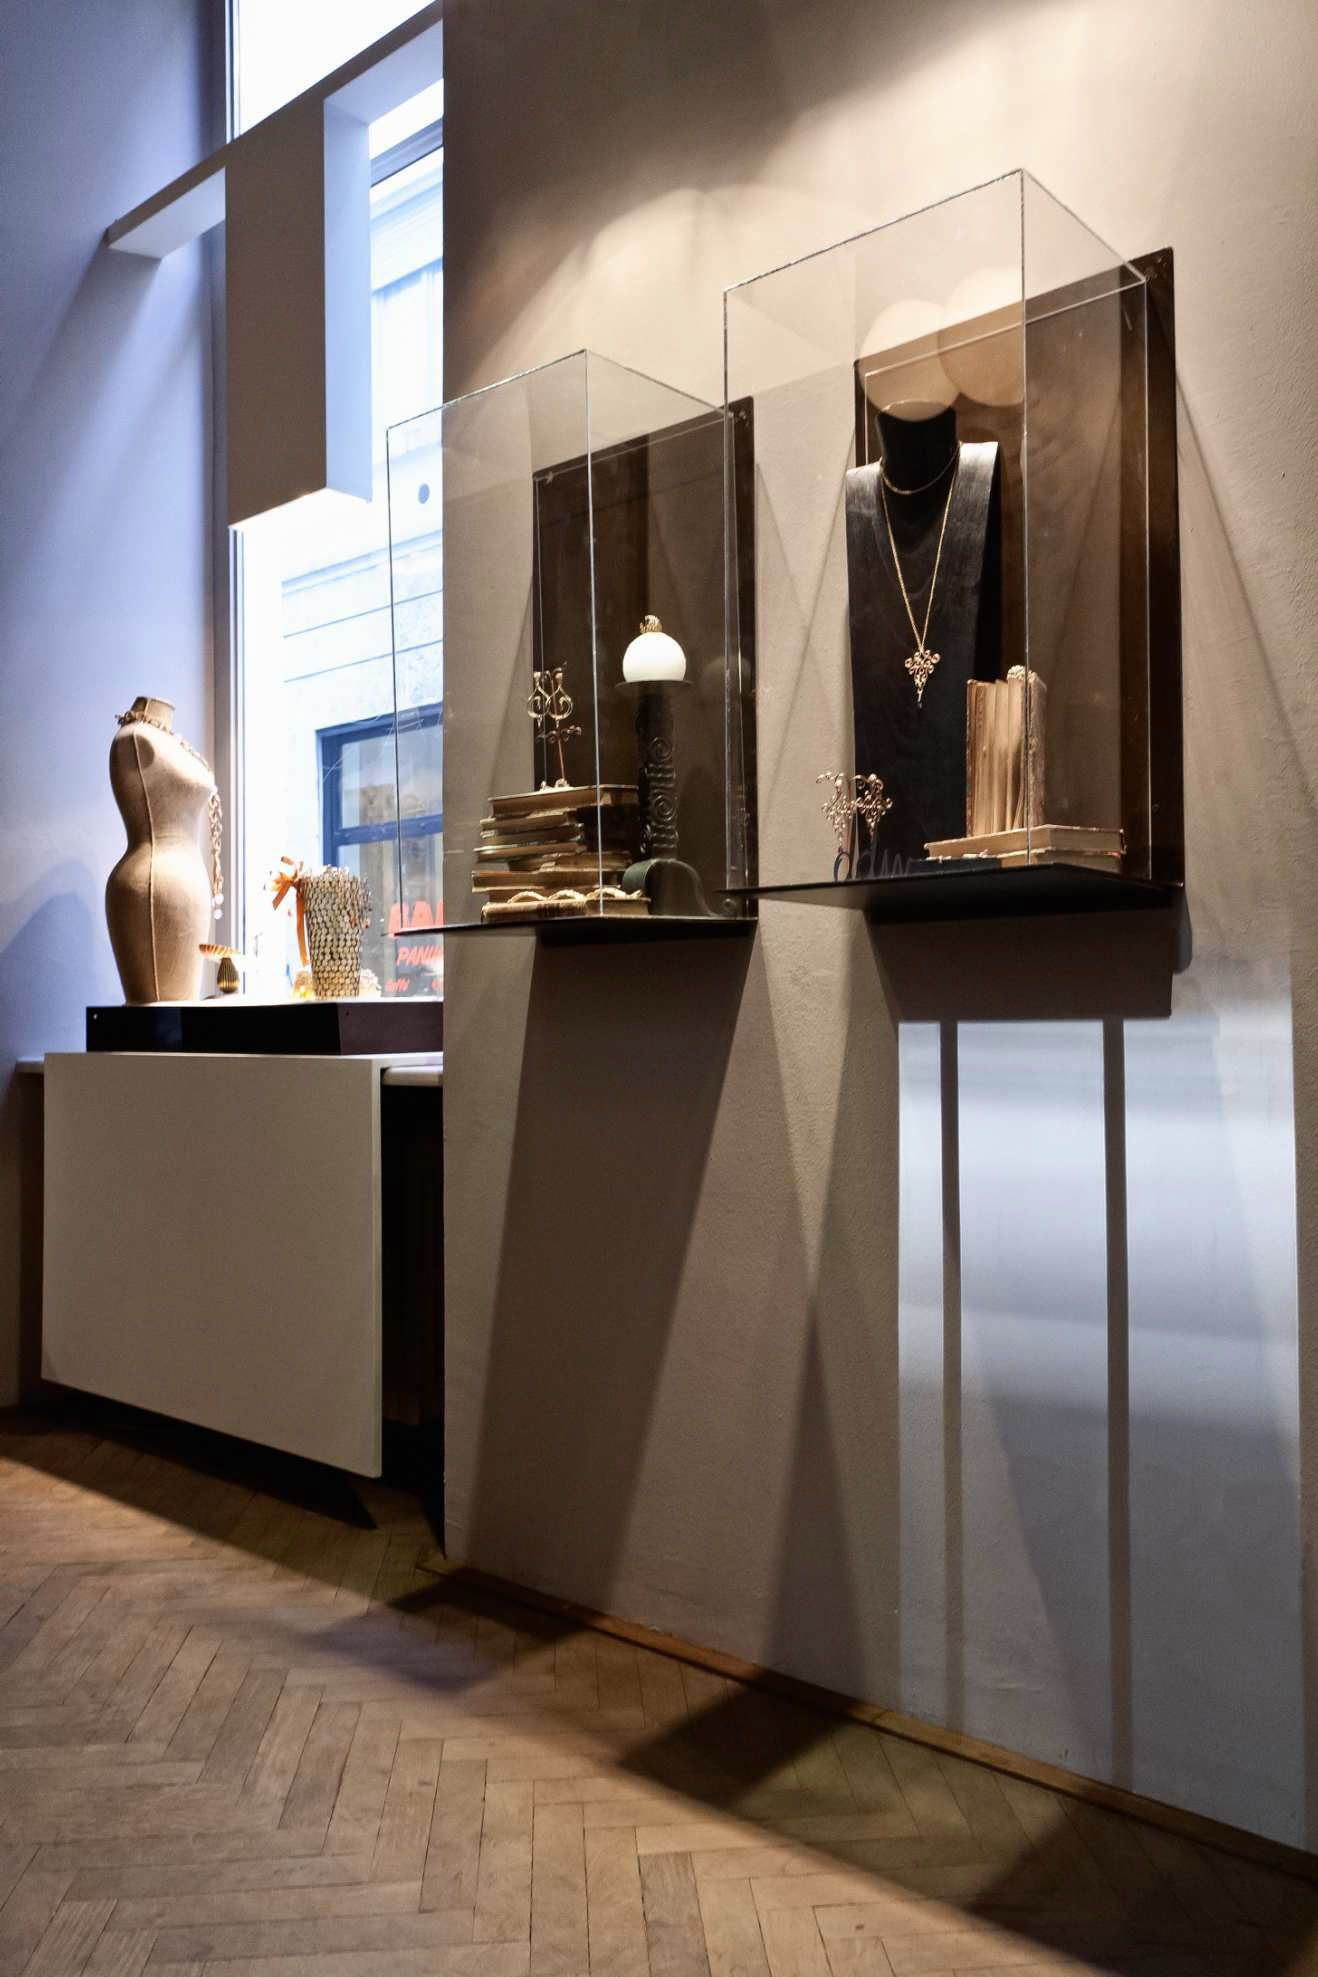 De Beers Jewelry By CAPS Architecture Interior Design Tokyo Store